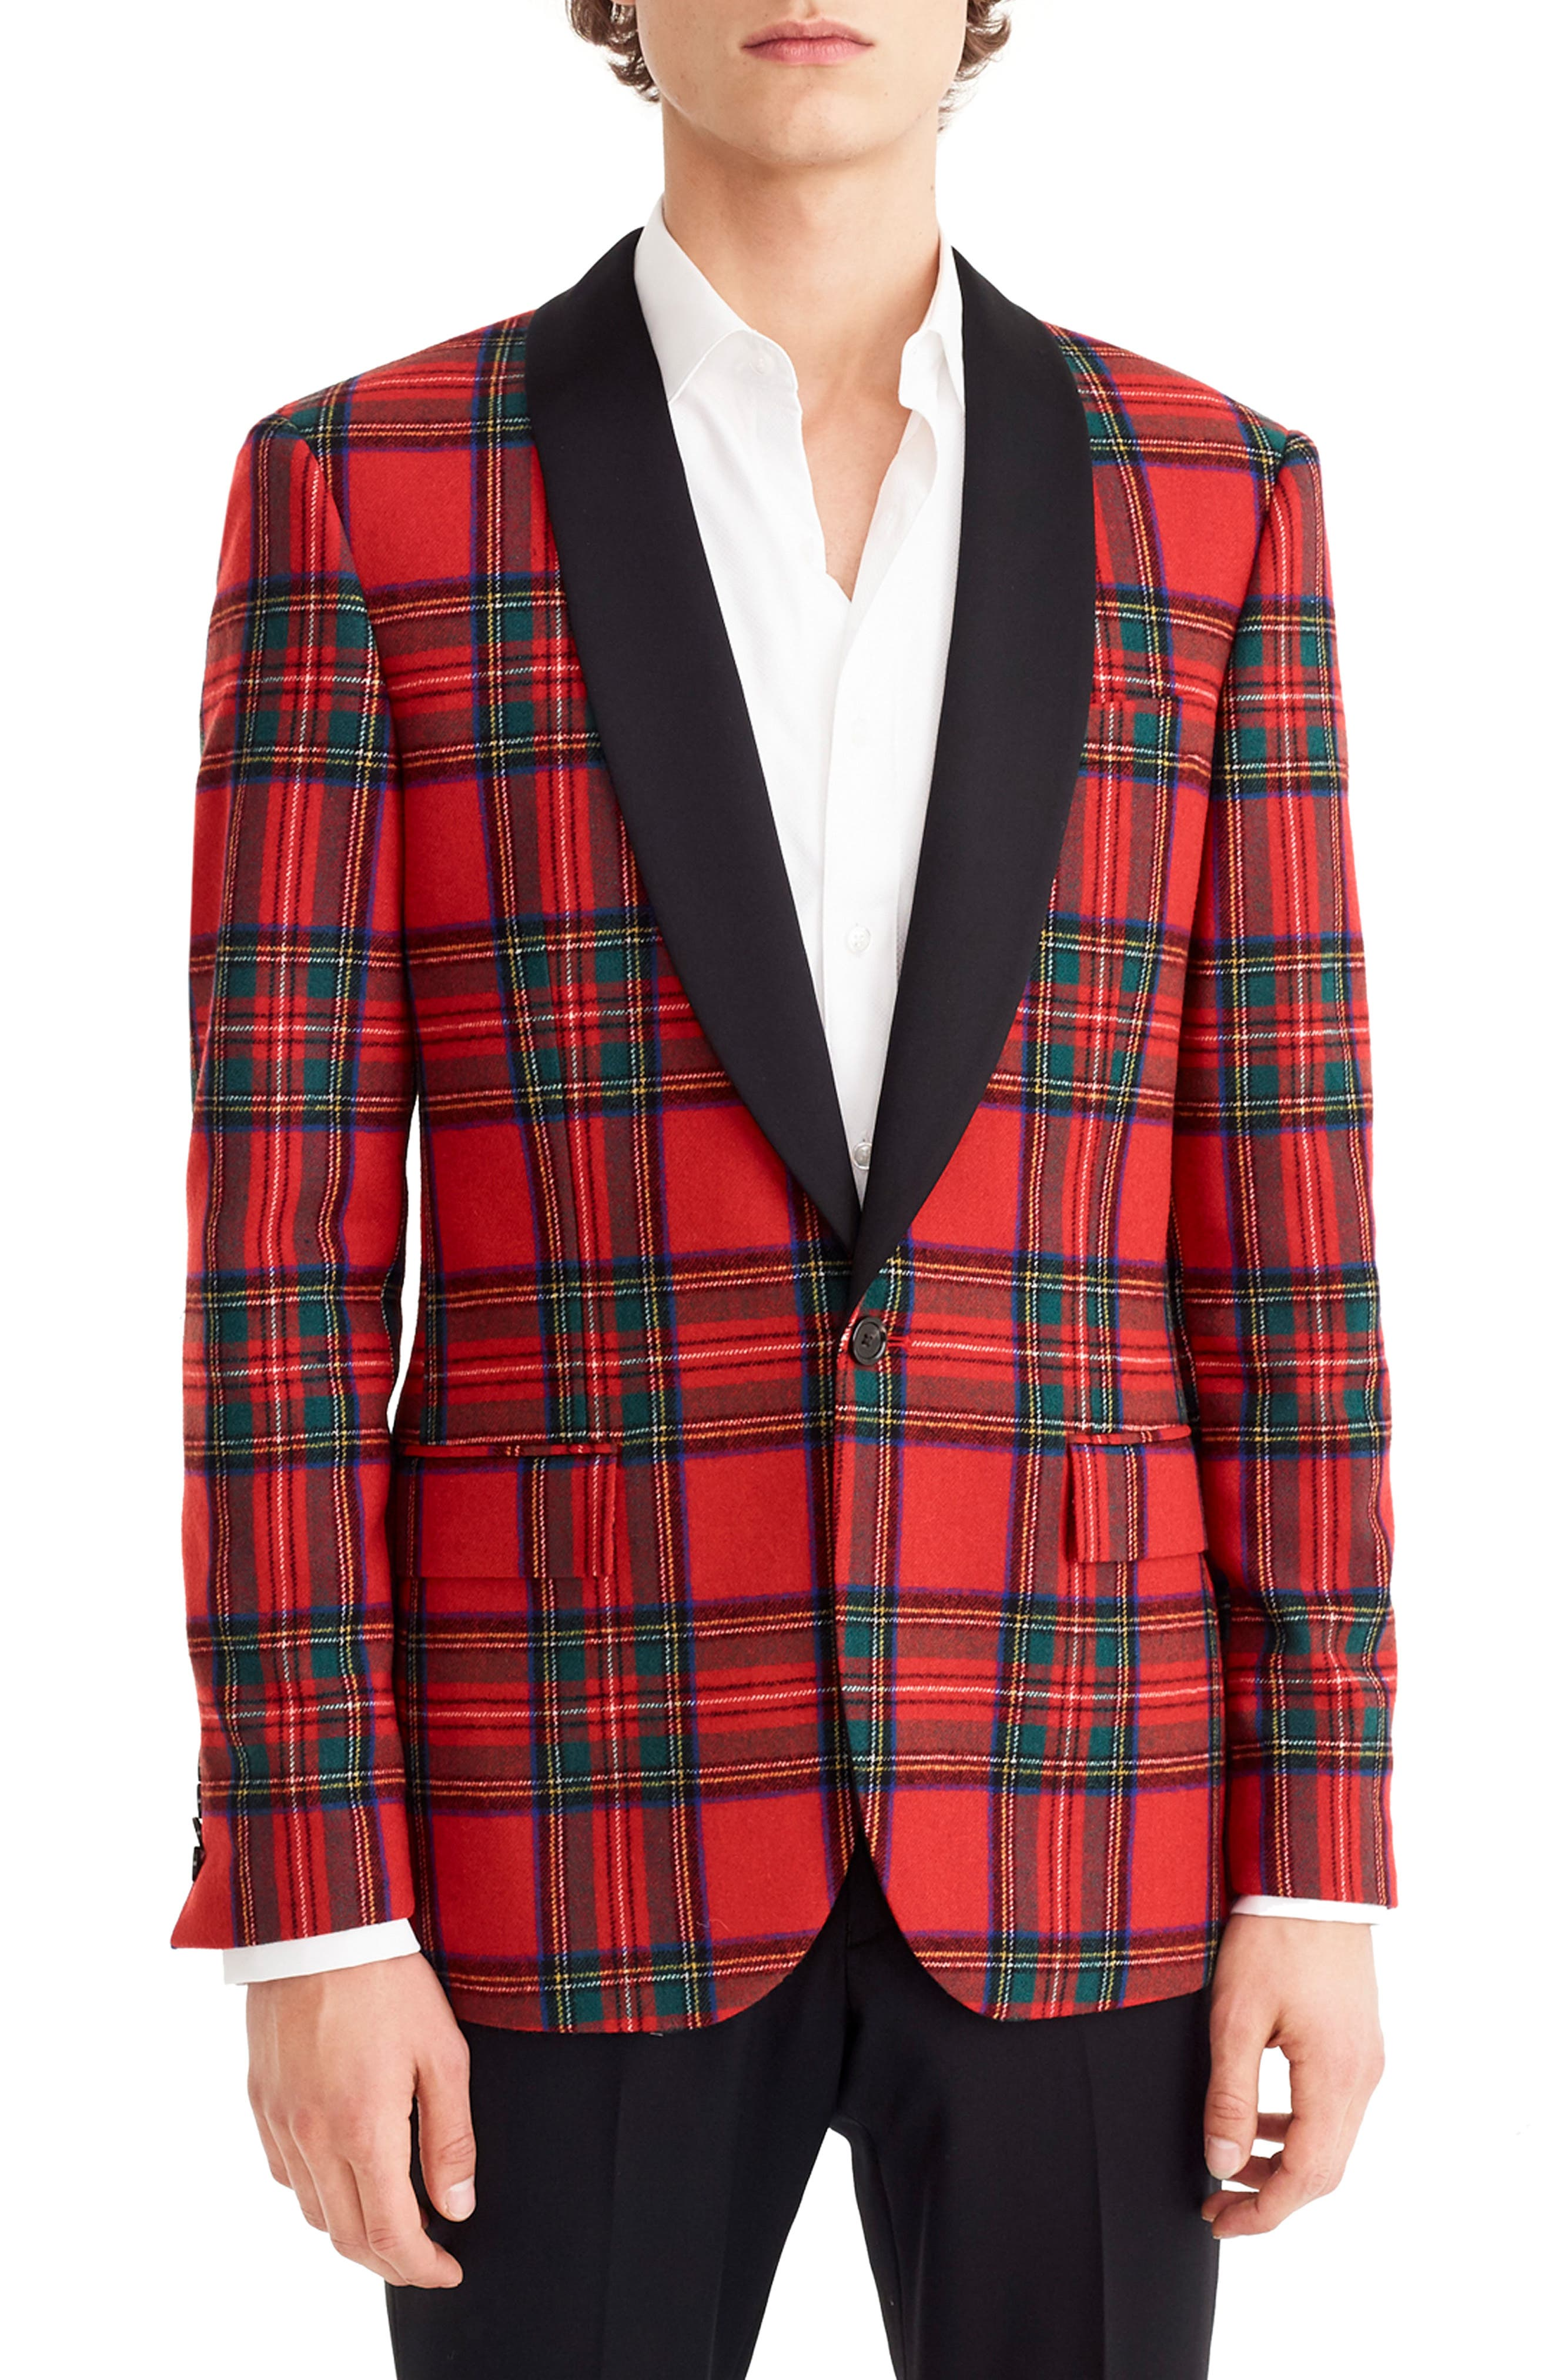 J.CREW,                             Ludlow Slim Fit Tartan Wool Blend Dinner Jacket,                             Main thumbnail 1, color,                             600